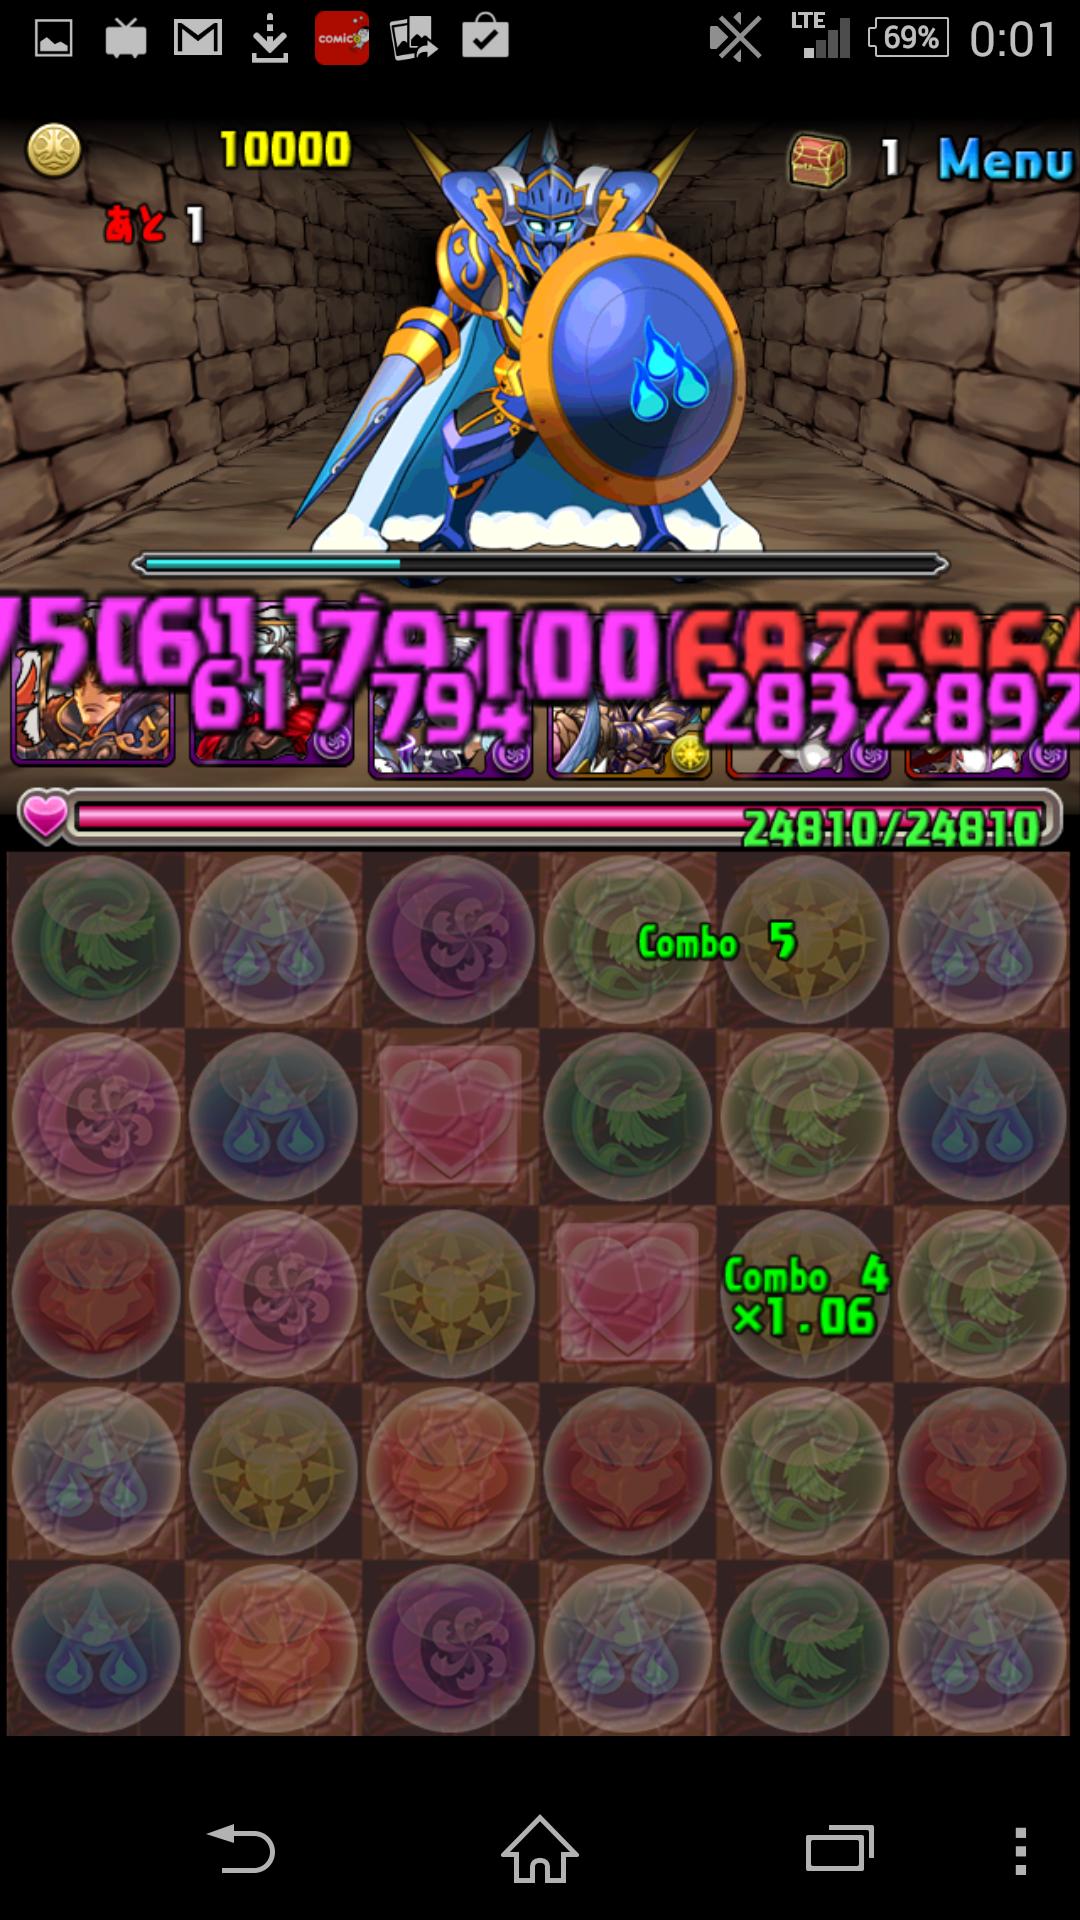 Screenshot_2014-10-22-00-01-12.png